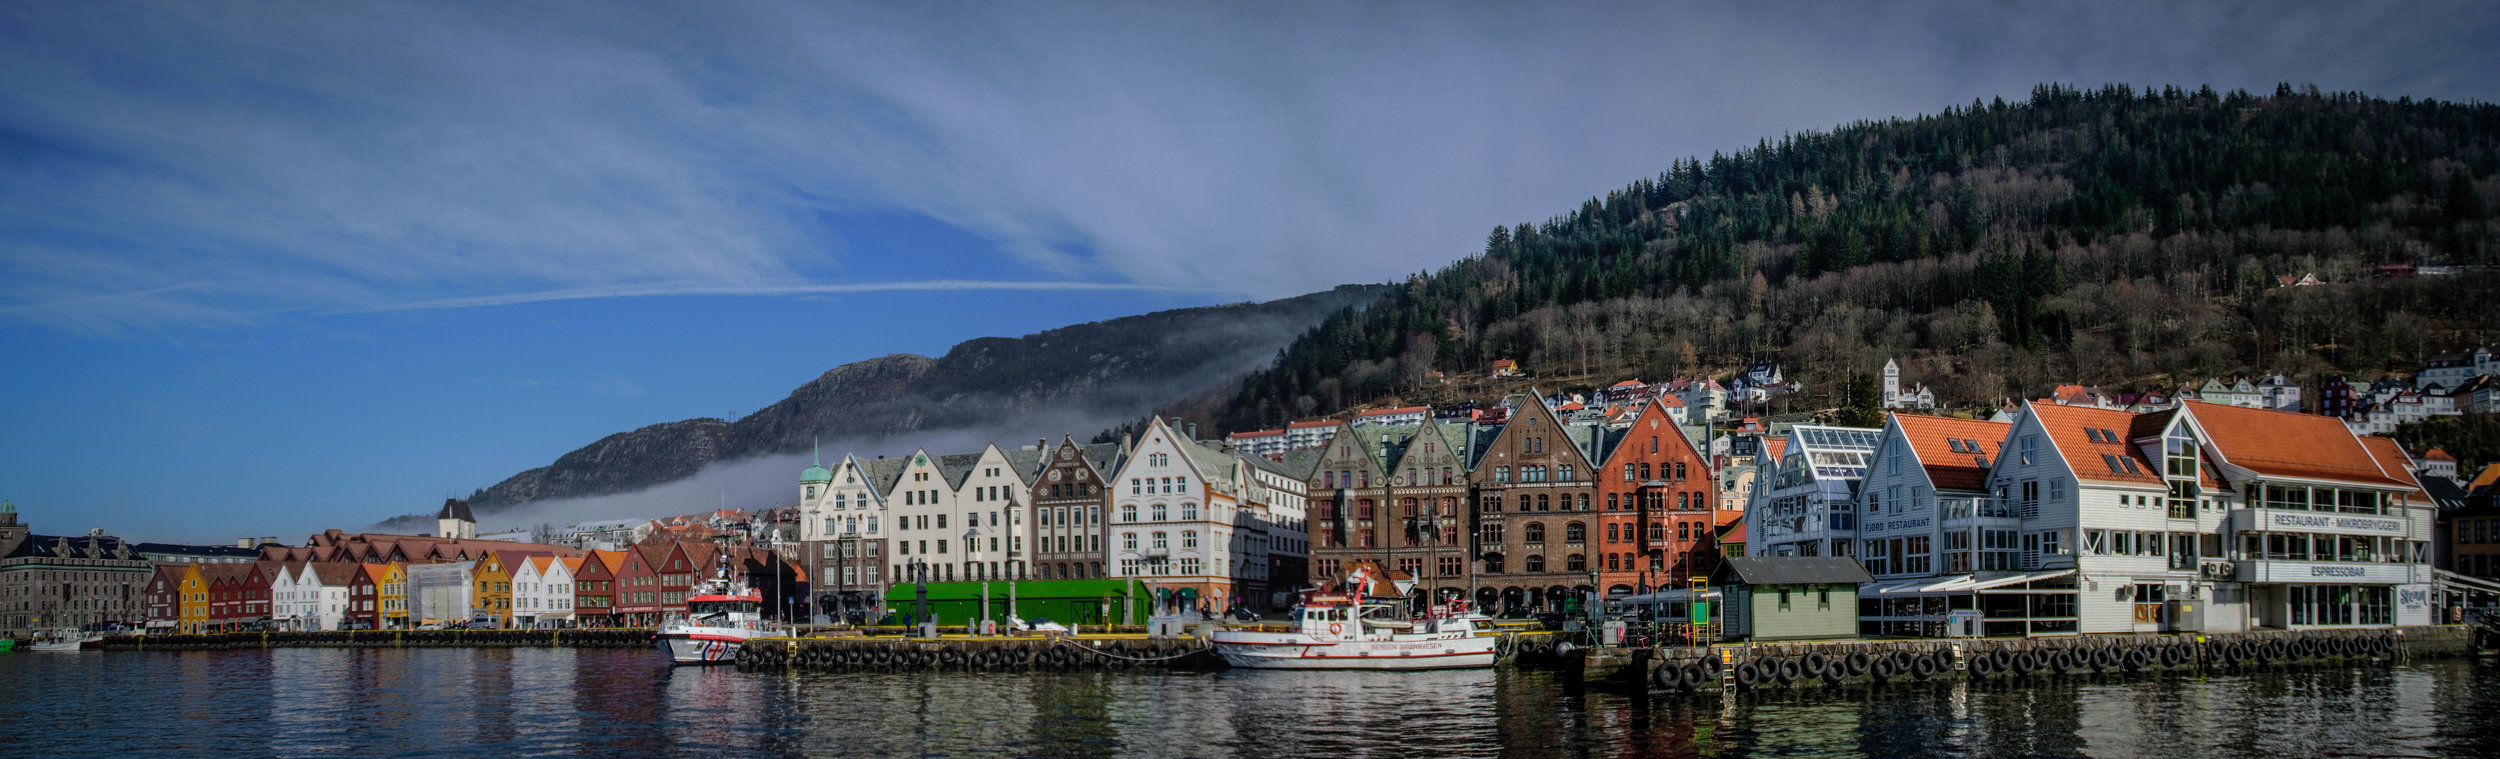 Bryggen, Bergen. ©Iain MacFadzean/Wikimedia Commons  ( CC-BY-SA-4.0 )